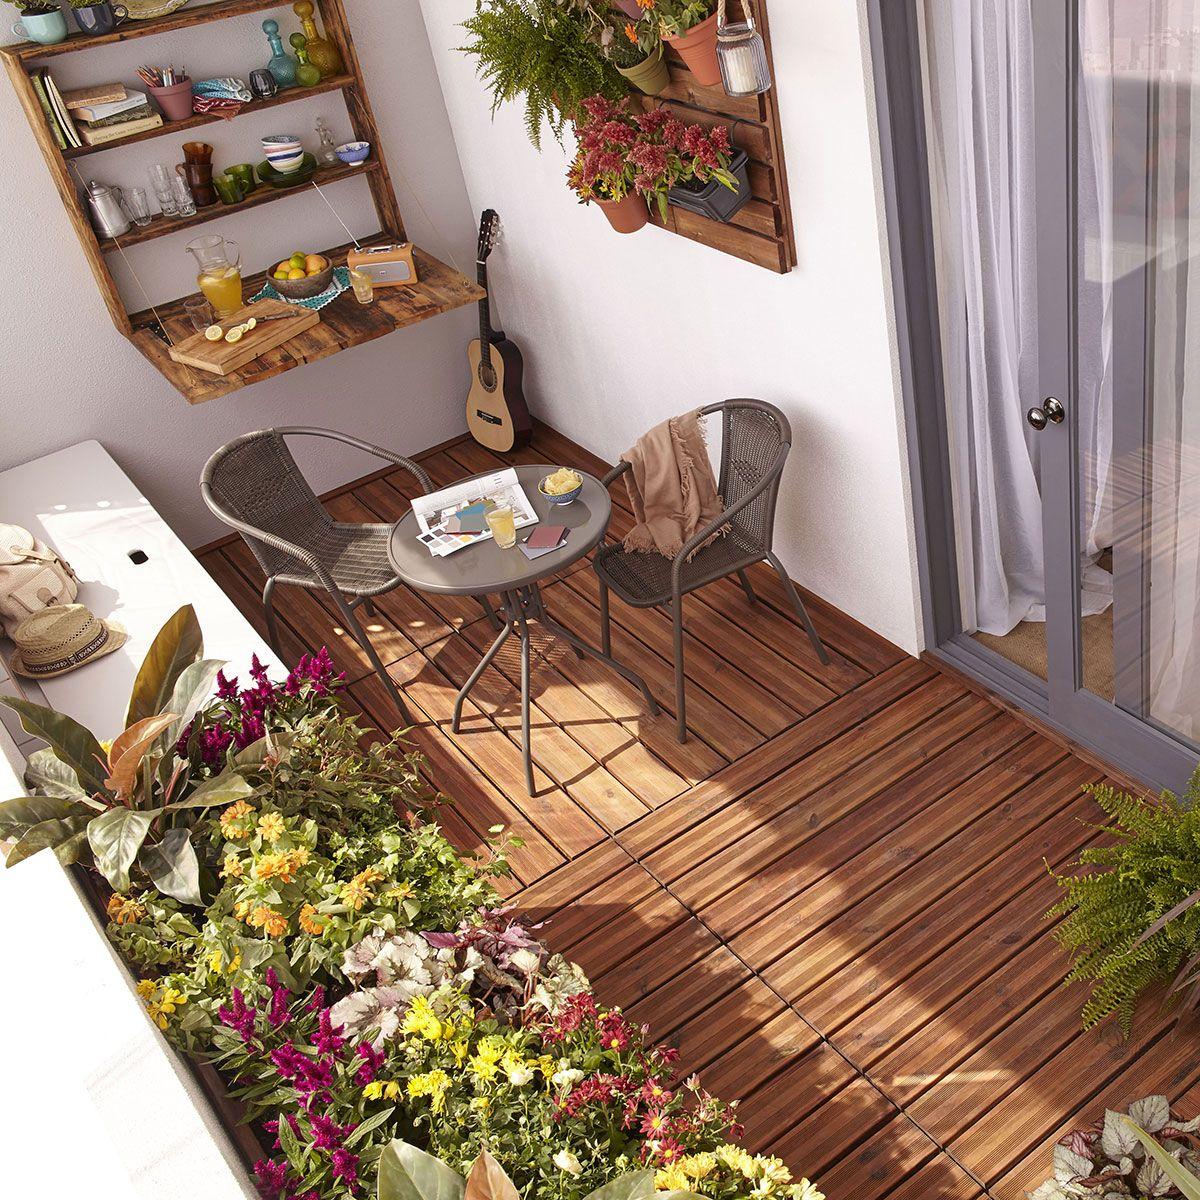 lot table de jardin ronde blooma bari grise 60 cm 2 fauteuils de jardin bari terrasses. Black Bedroom Furniture Sets. Home Design Ideas